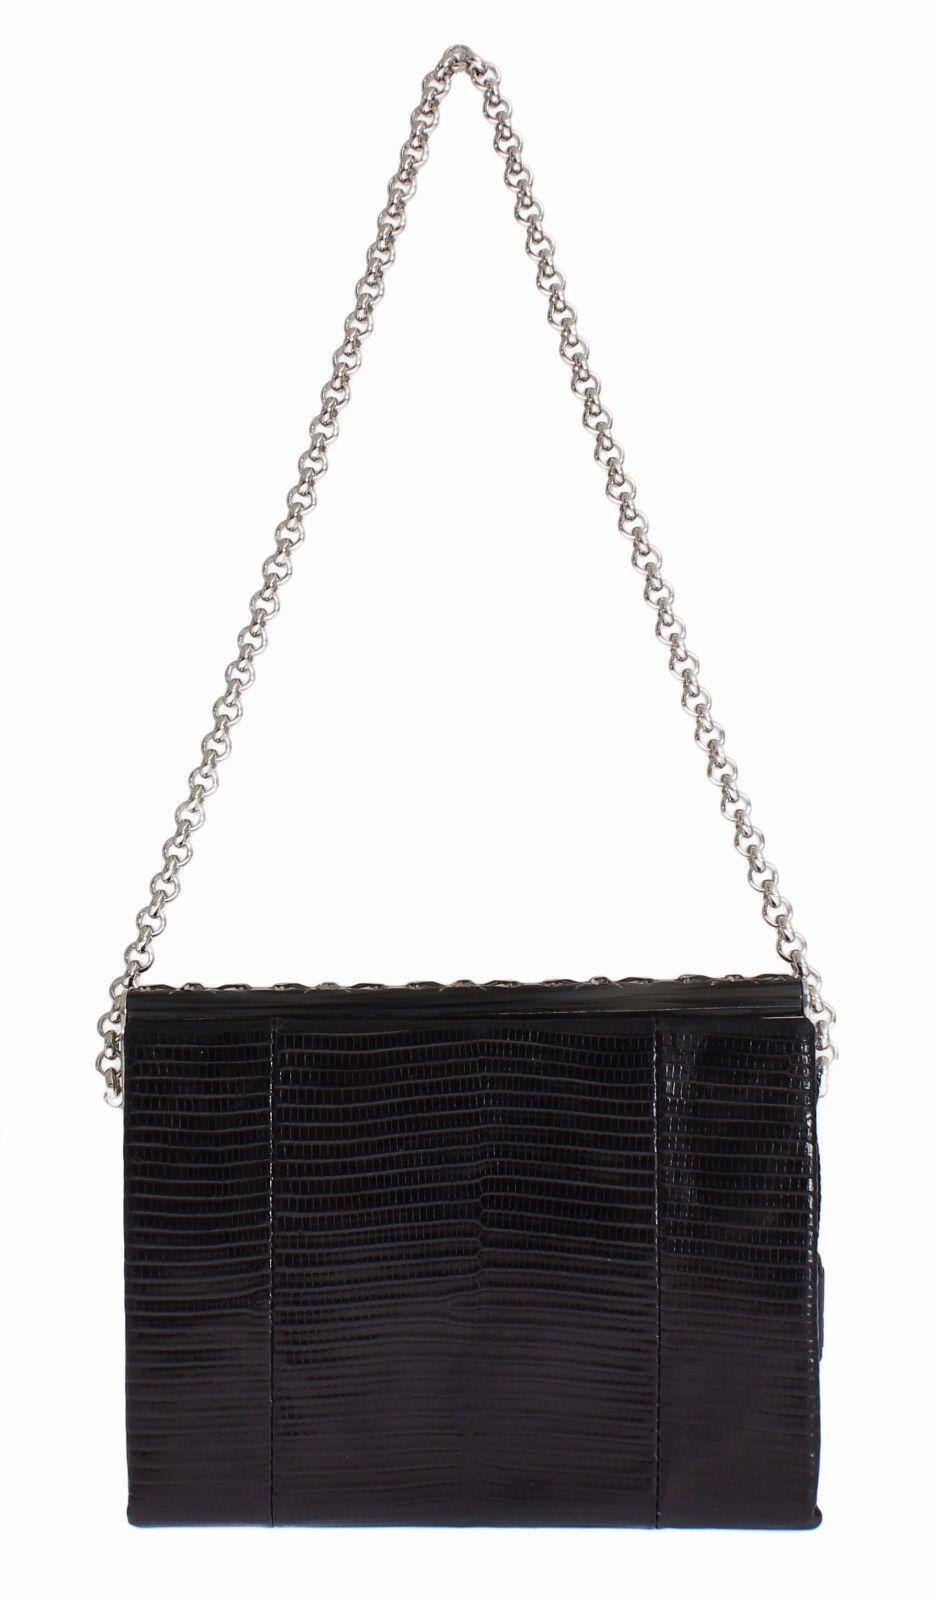 Dolce & Gabbana Women's Varano Lizard Evening Party Shoulder Bag Black SIG15209